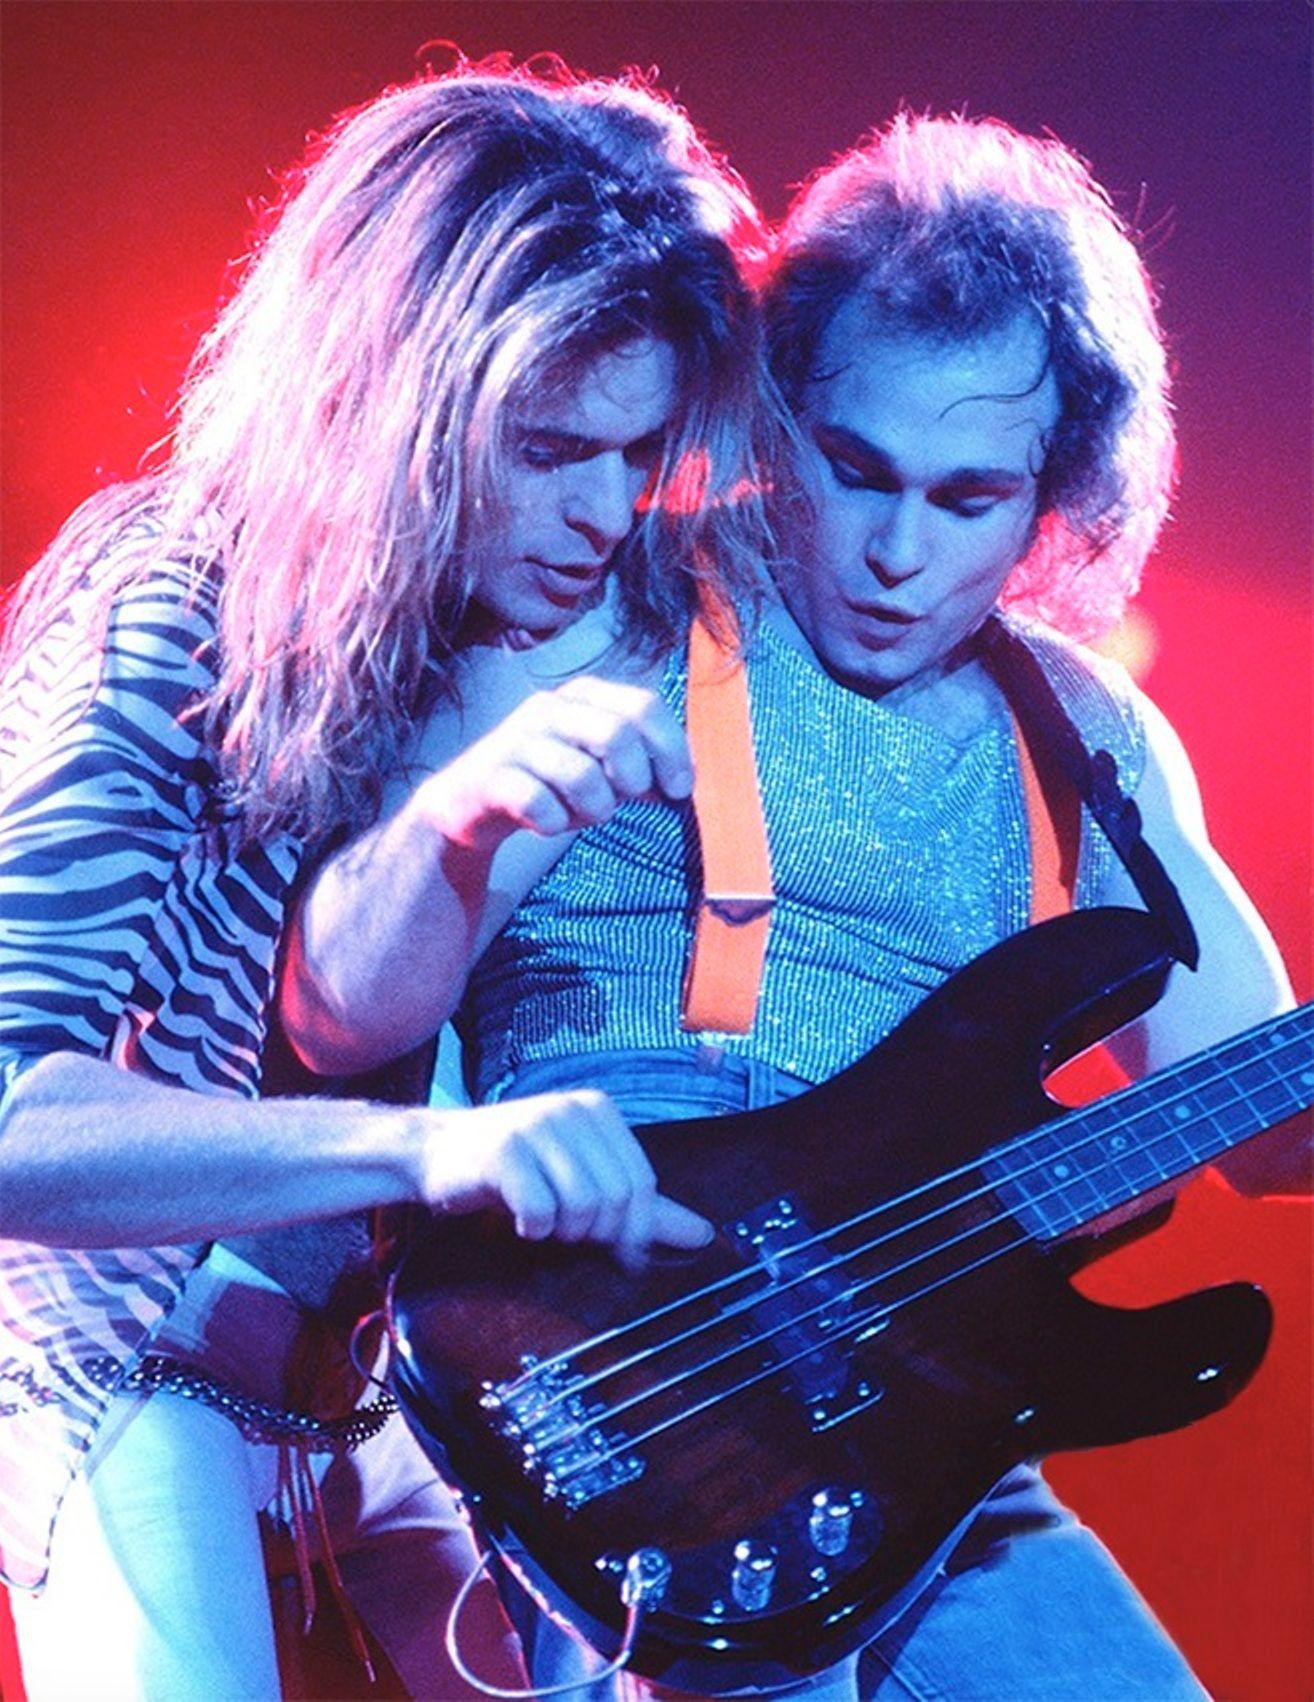 David Lee Roth And Michael Anthony 1979 Van Halen Eddie Van Halen Rock And Roll